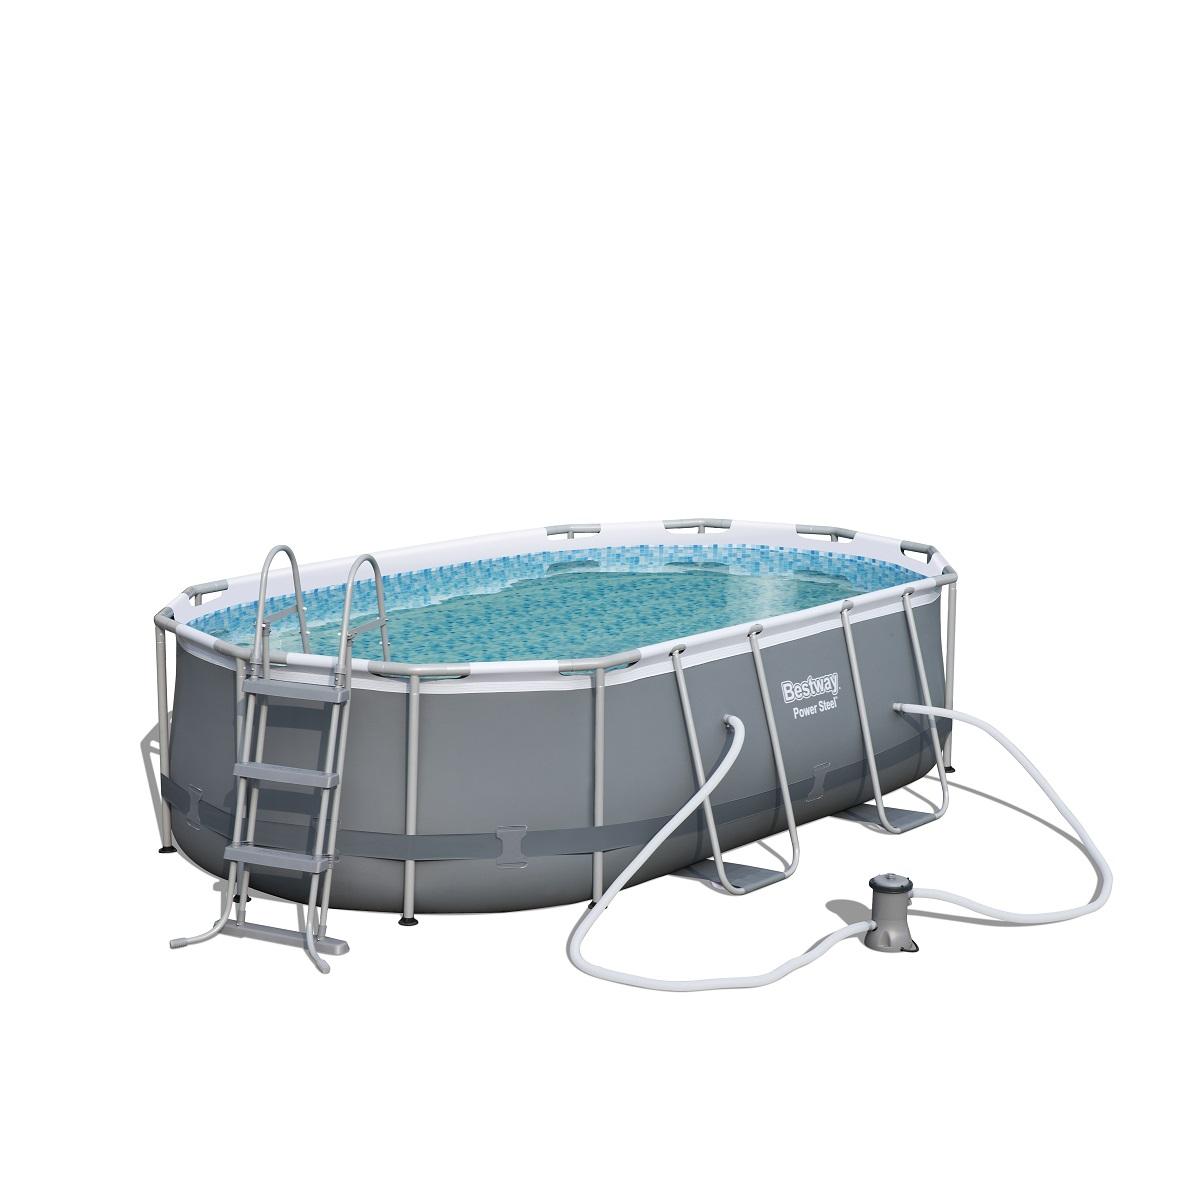 Bazén BESTWAY Power Steel Pool 424 x 250 x 100 cm set s kartušovou filtrací